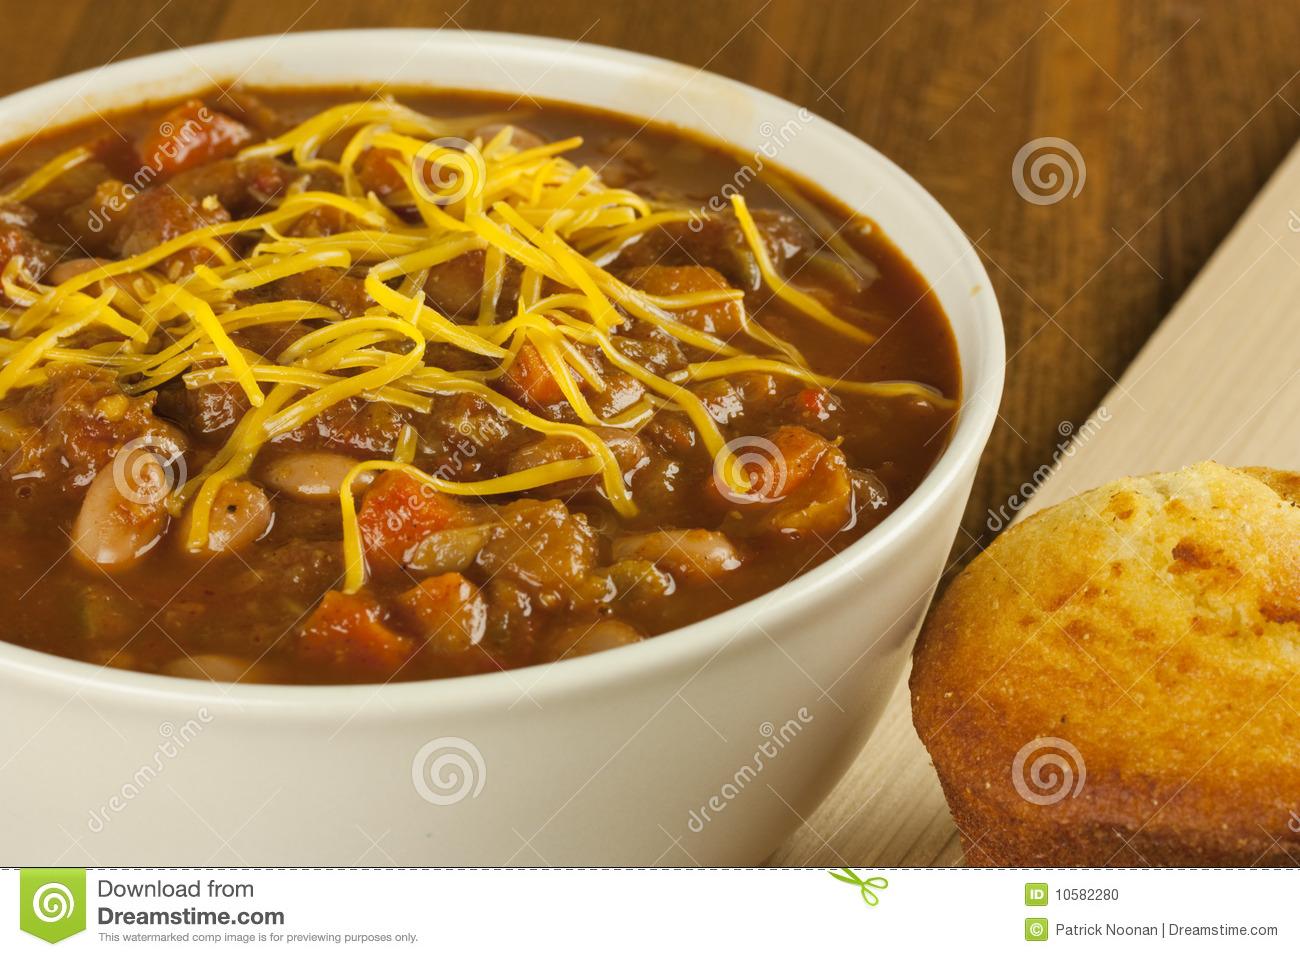 Bowl Of Chili With Cornbread Stock Photo.